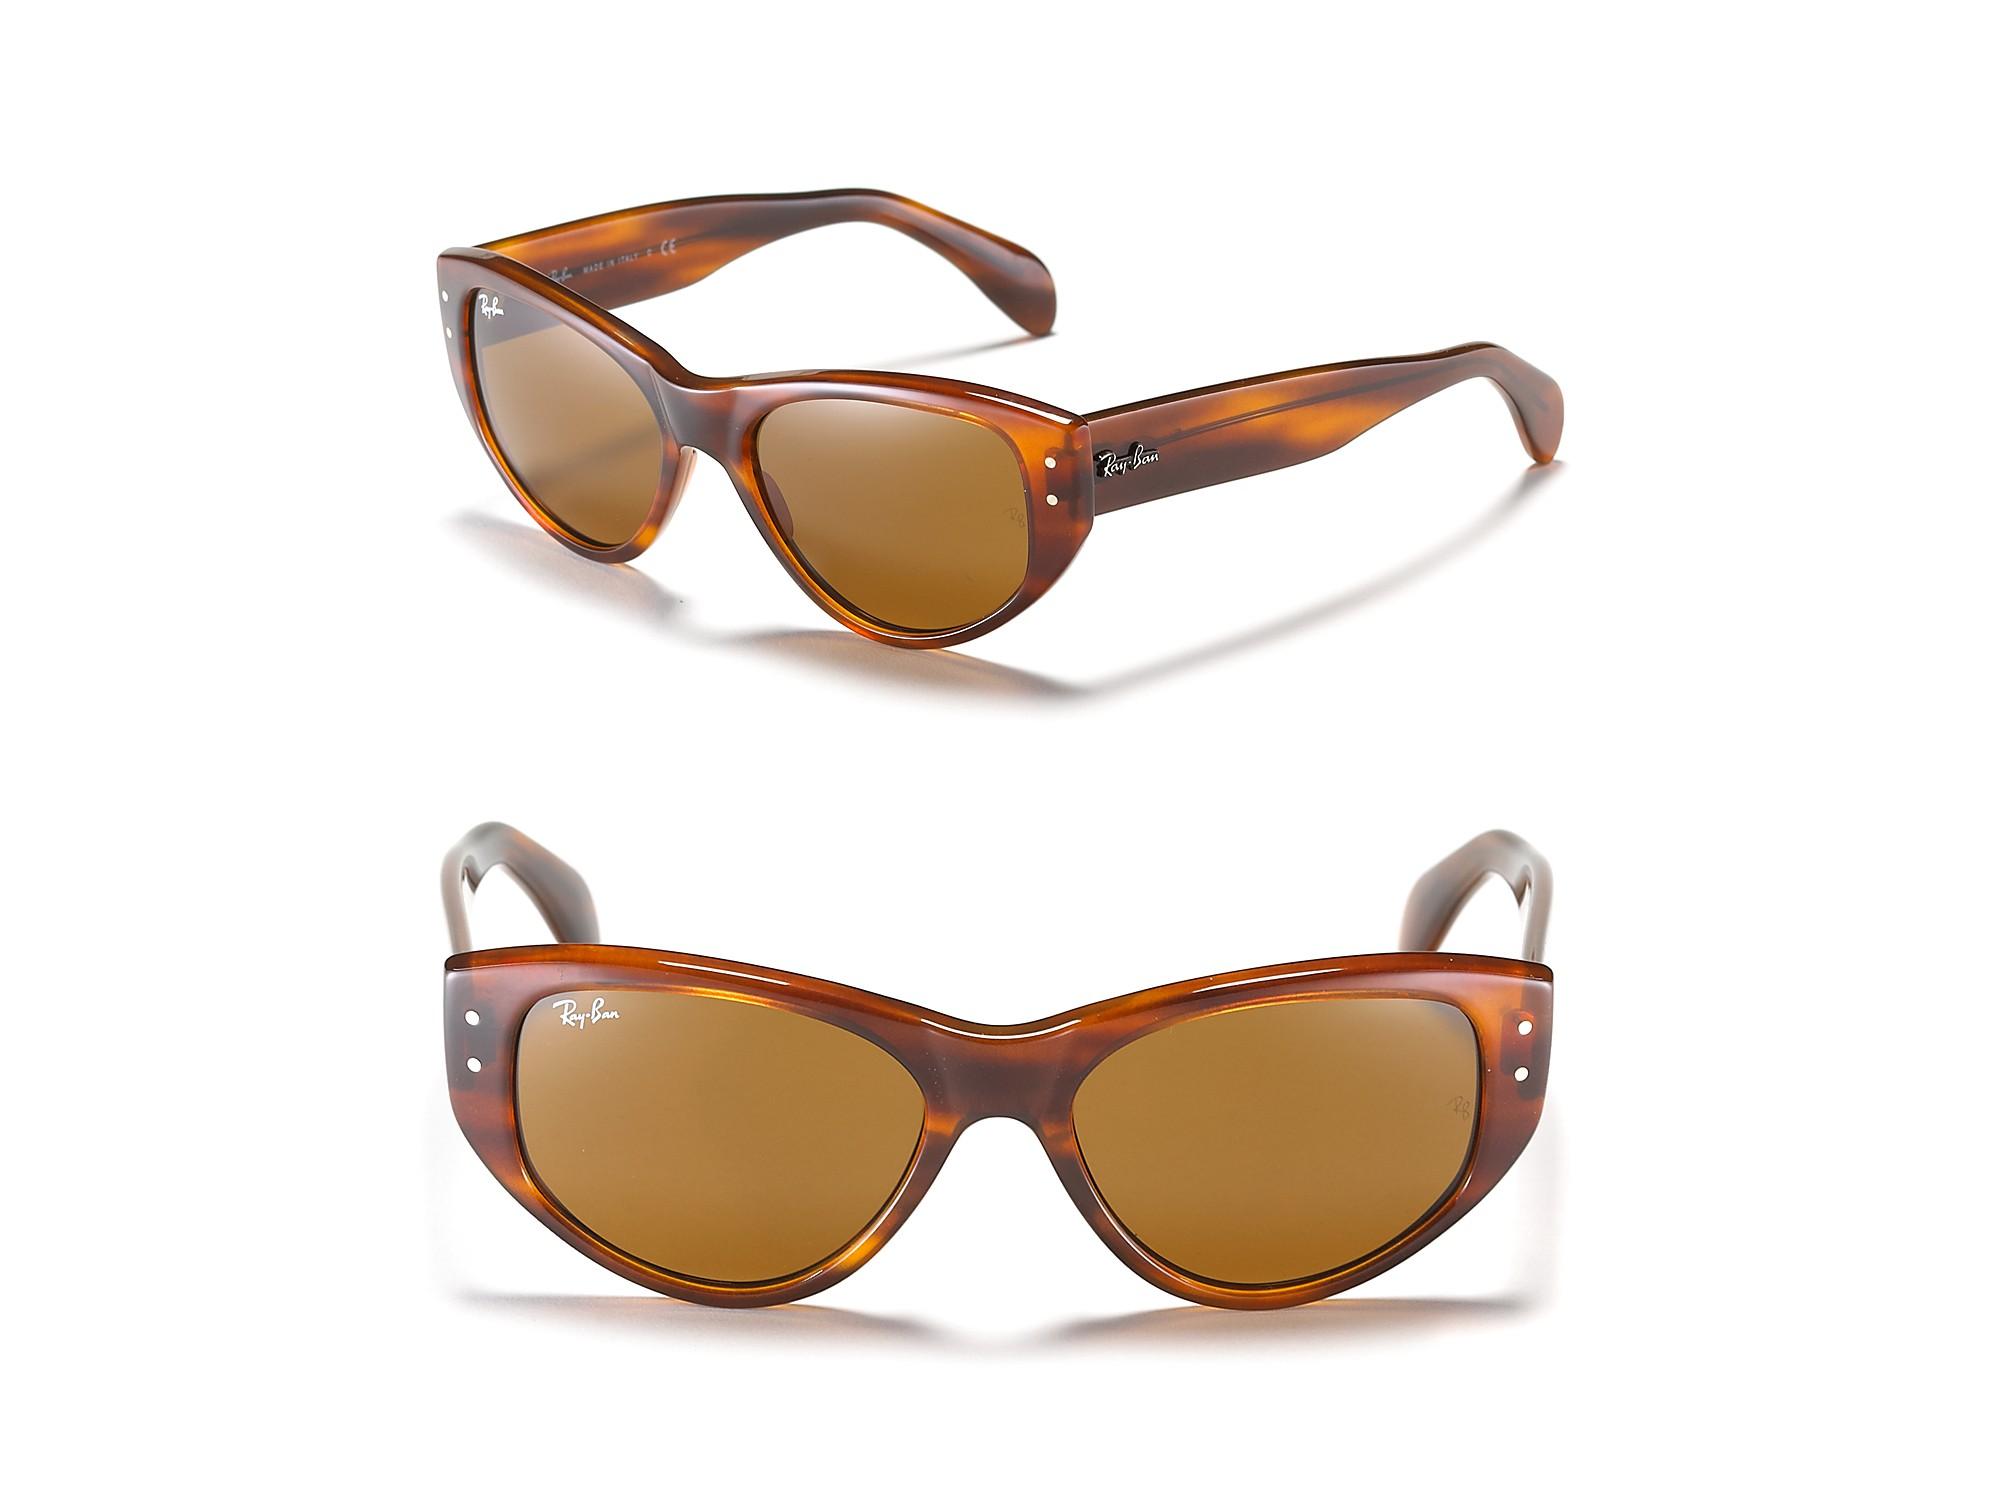 ray ban vagabond cat eye sunglasses in brown havana lyst. Black Bedroom Furniture Sets. Home Design Ideas